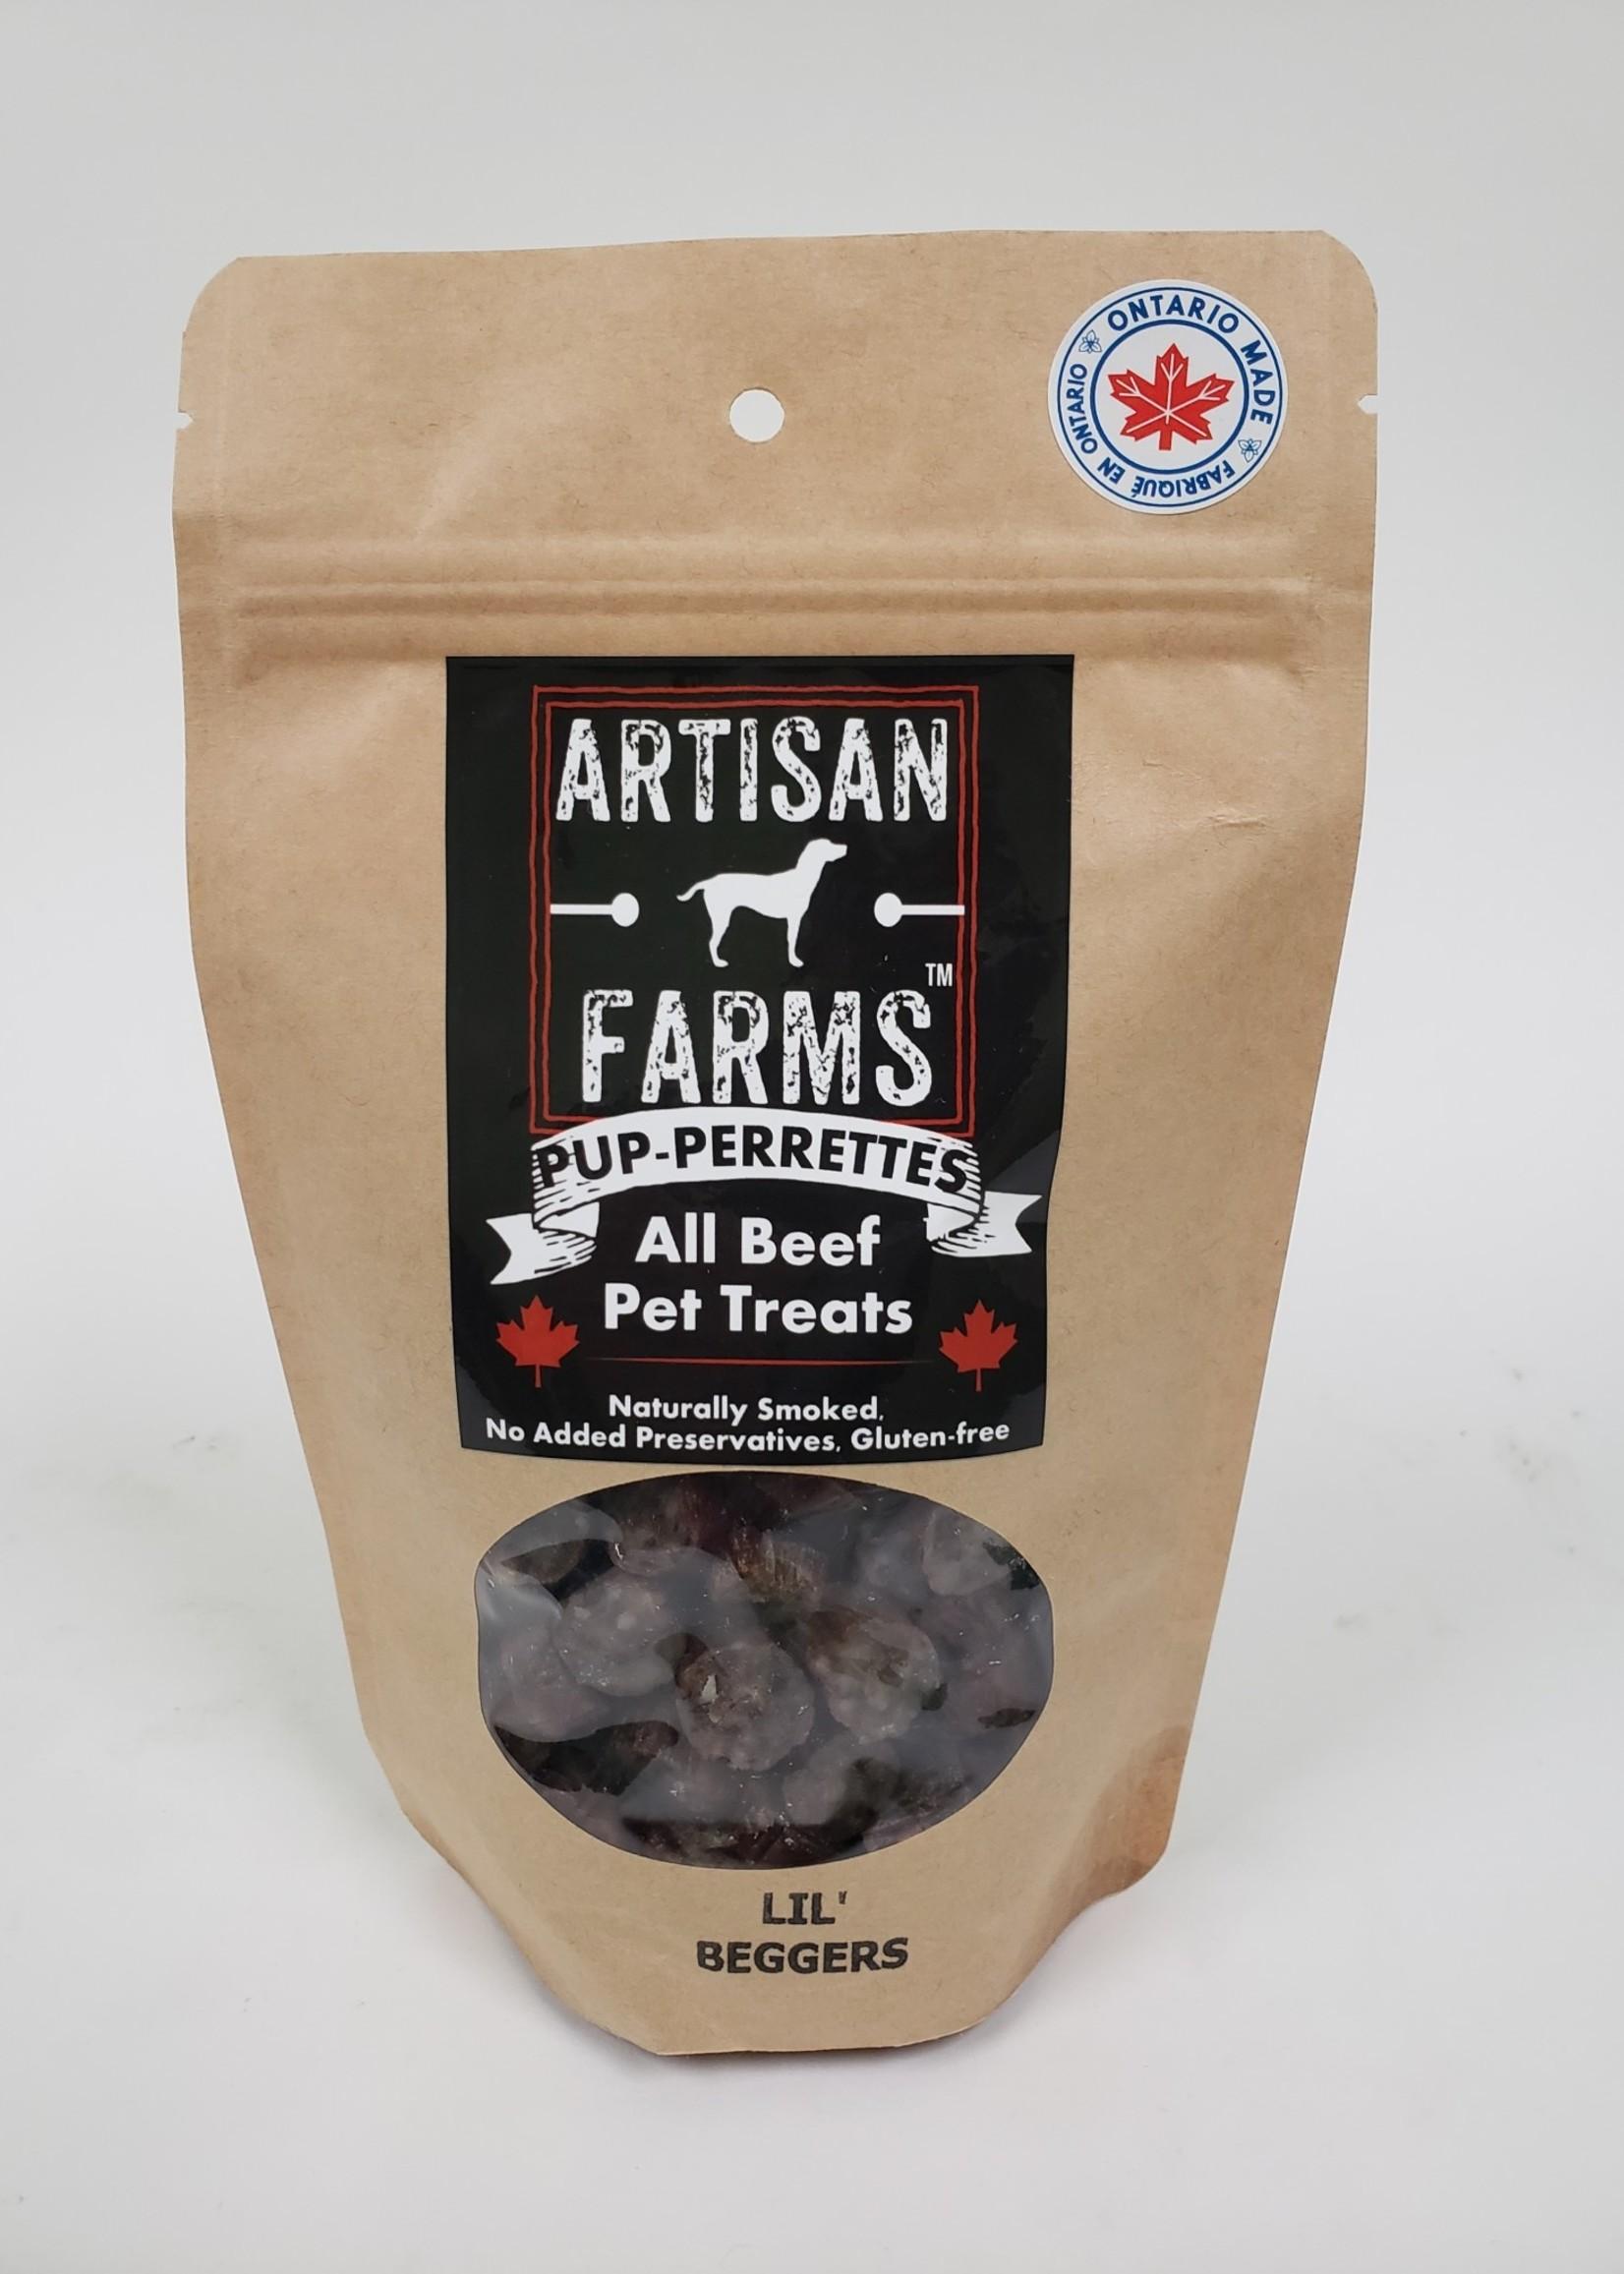 Artisan Farms® Artisan Farms Pup-Perrettes™ Lil' Beggers 130g